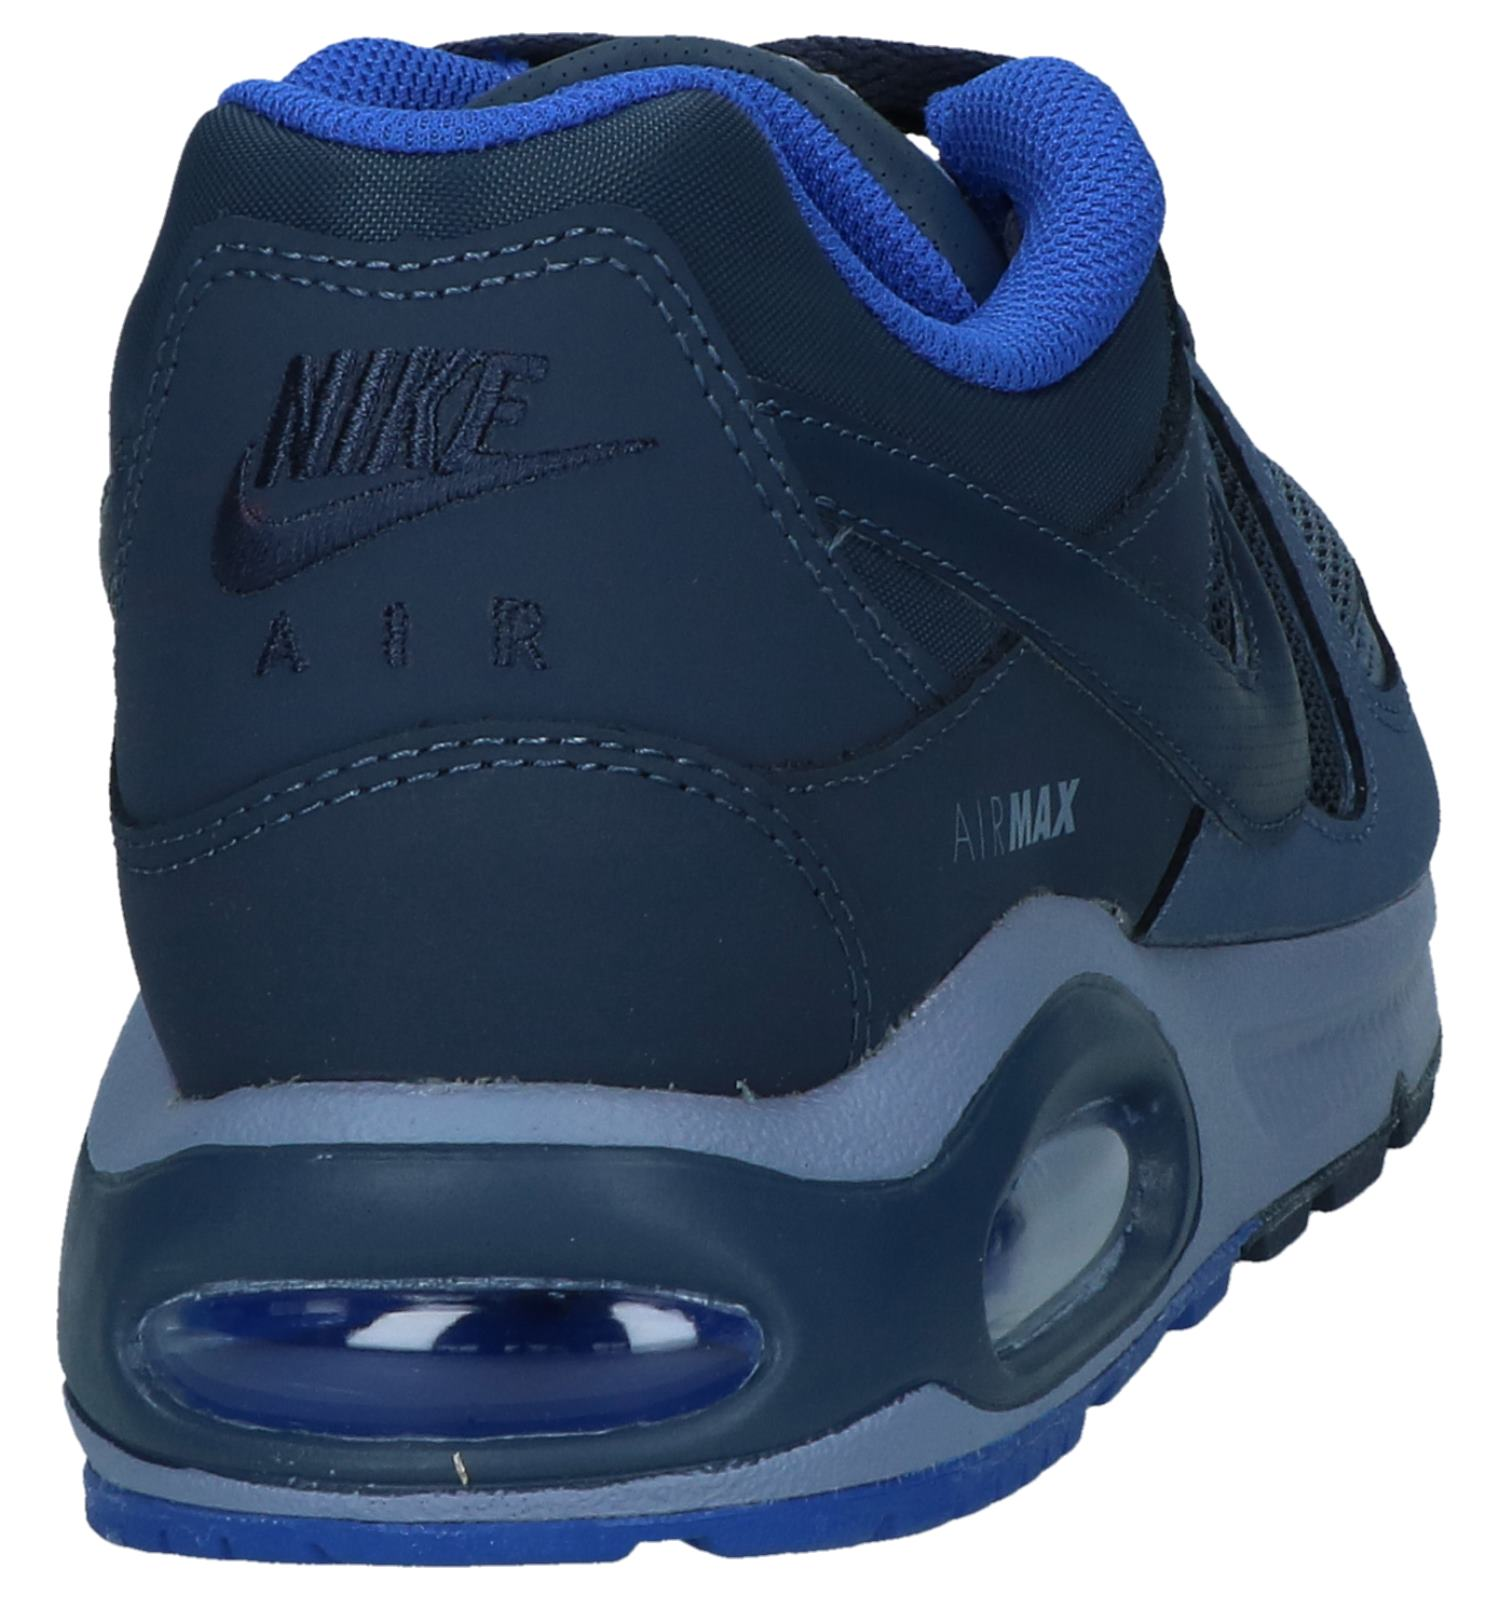 06fd4d8d664 Blauwe Sneakers Nike Air Max Command | TORFS.BE | Gratis verzend en retour